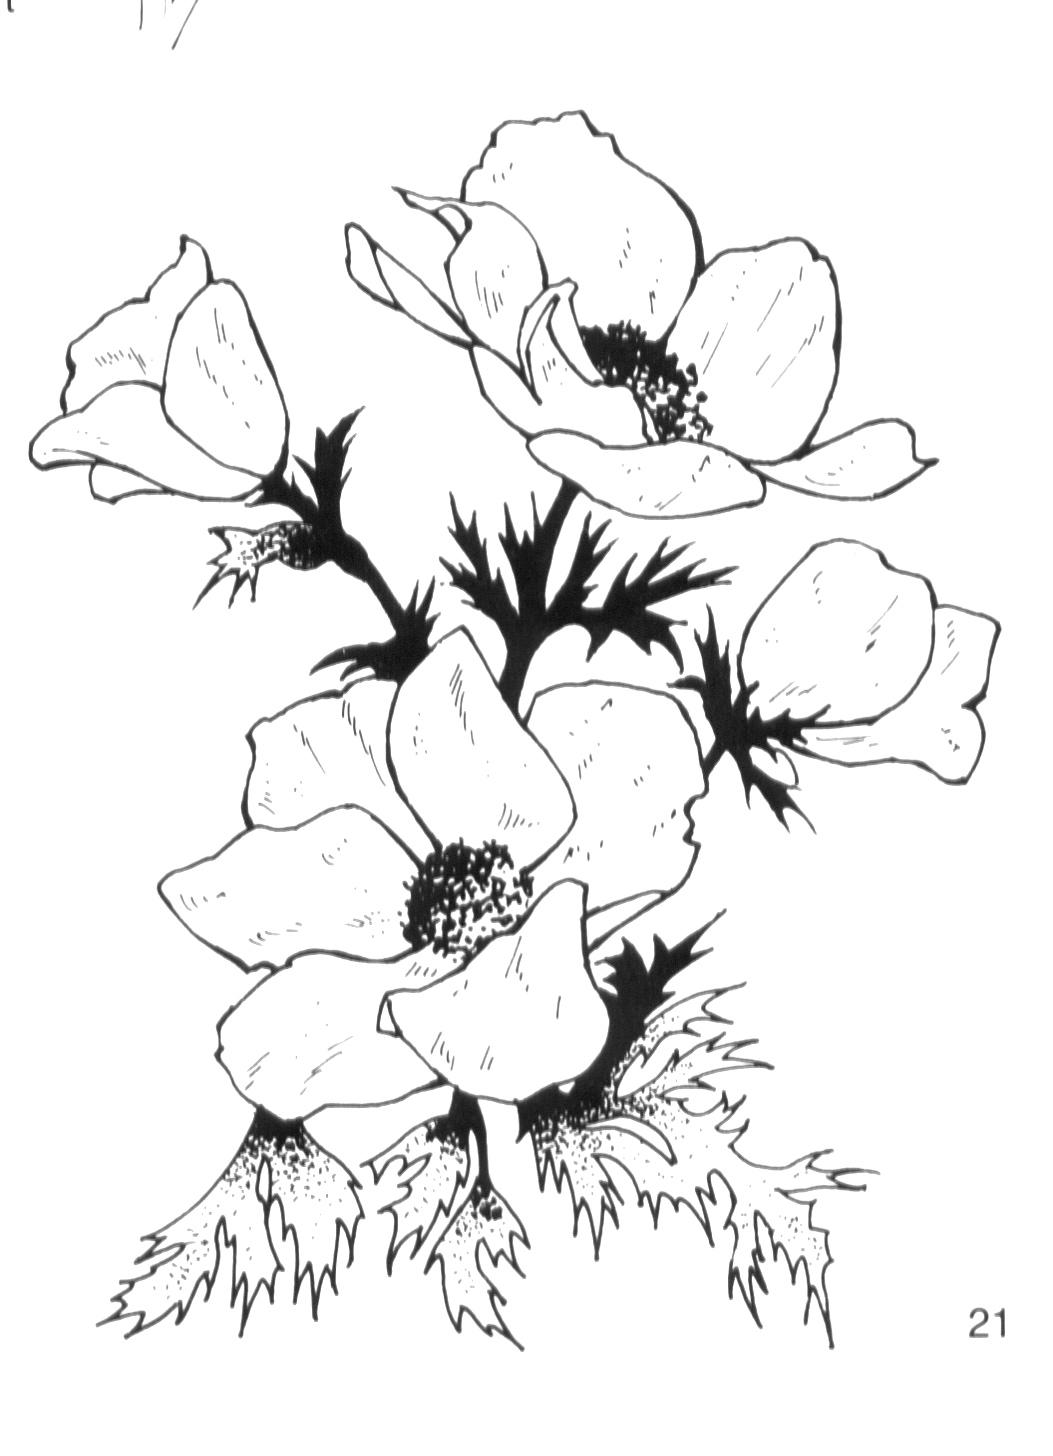 Anemone Flower Drawing : anemone, flower, drawing, Anemone, Flower, Cliparts,, Download, Clipart, Library